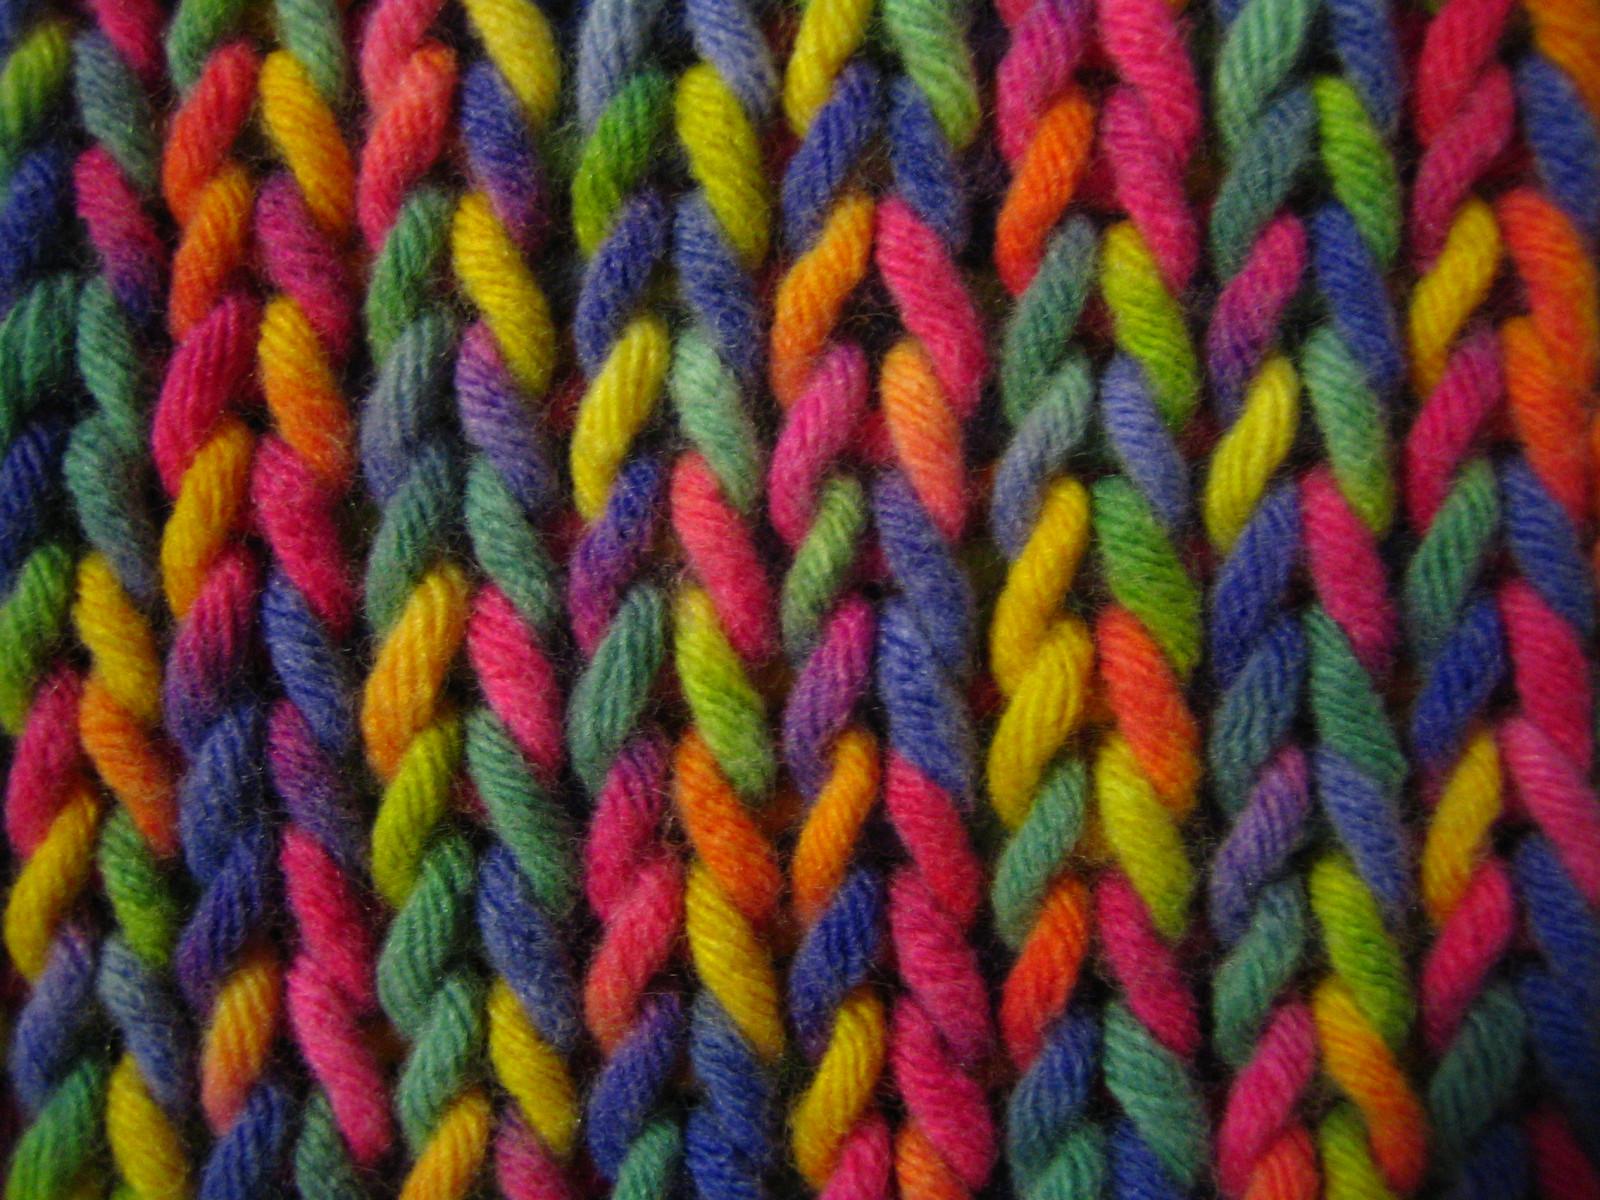 Hintergrundbilder : bunt, Winter, Makro, Grün, Gelb, blau, Muster ...